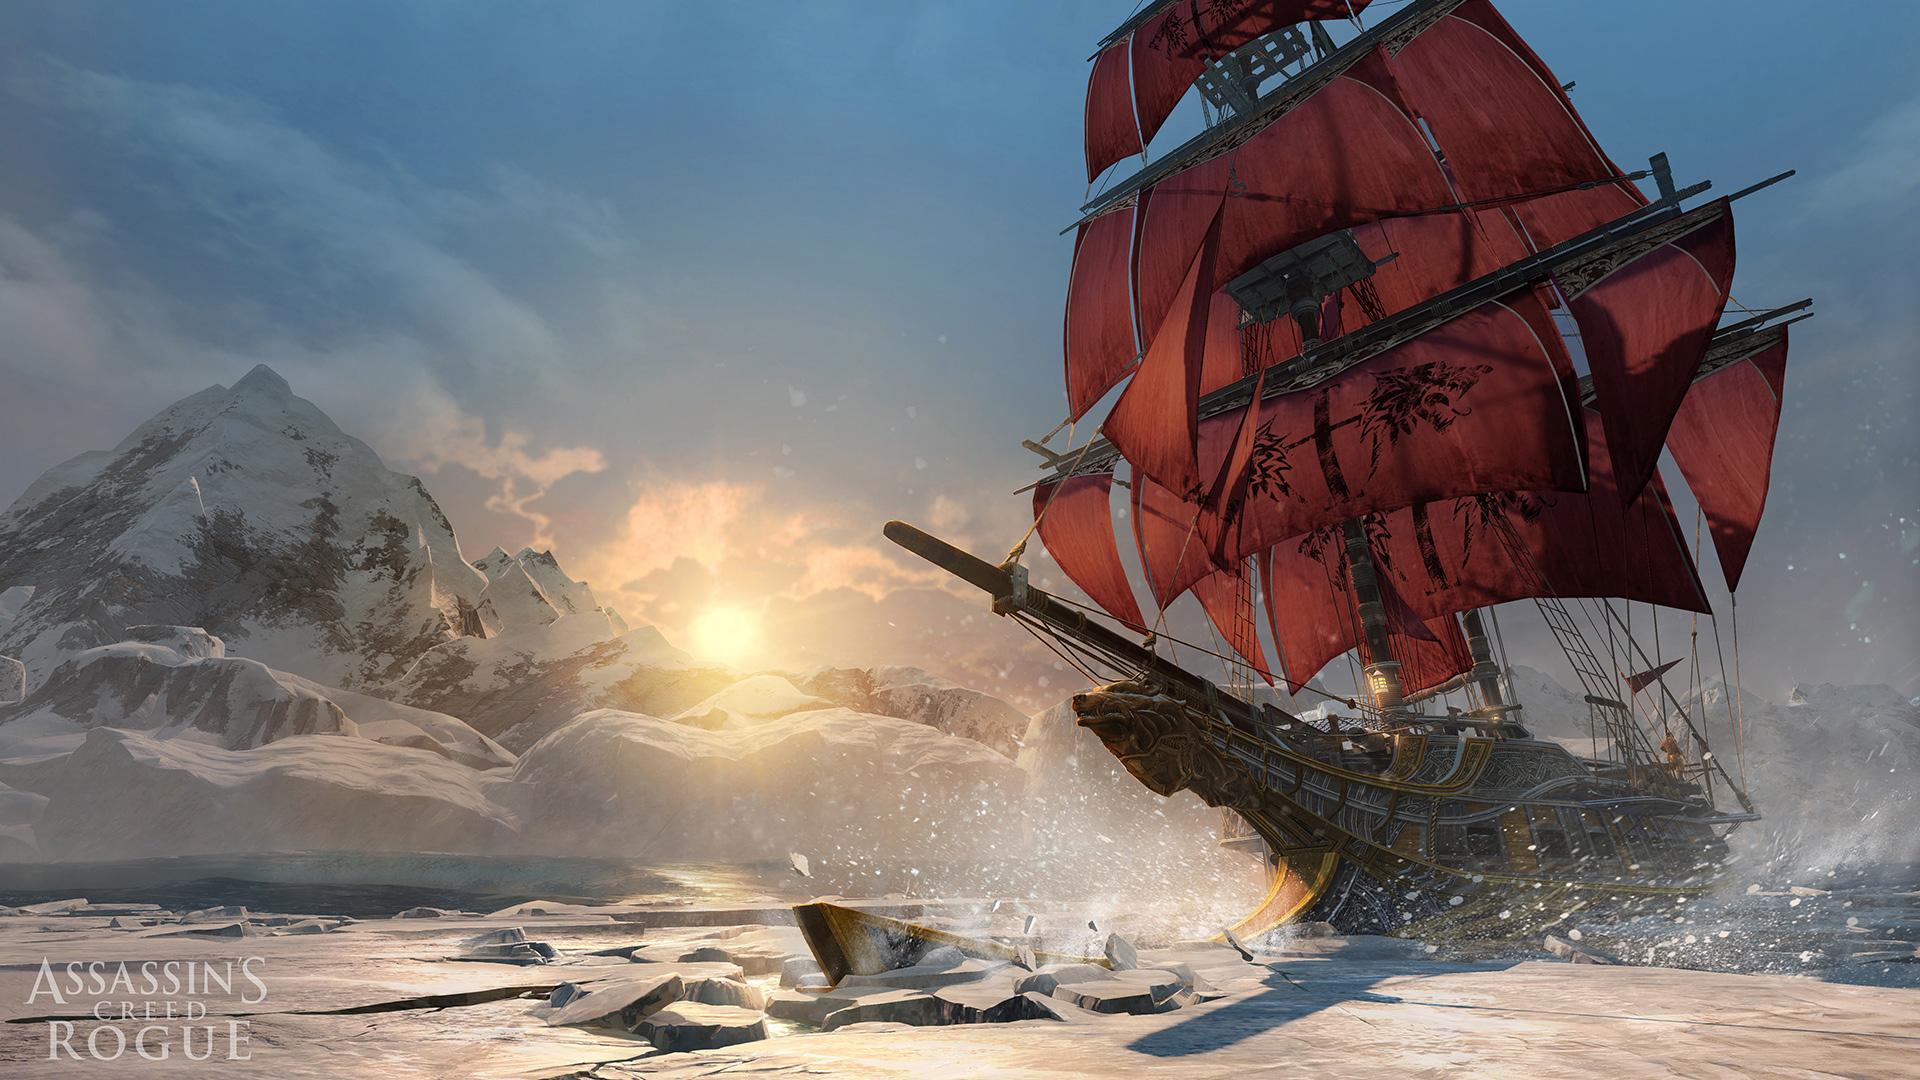 Preview Assassin's Creed Rogue - V roli lovce asasínů 9742